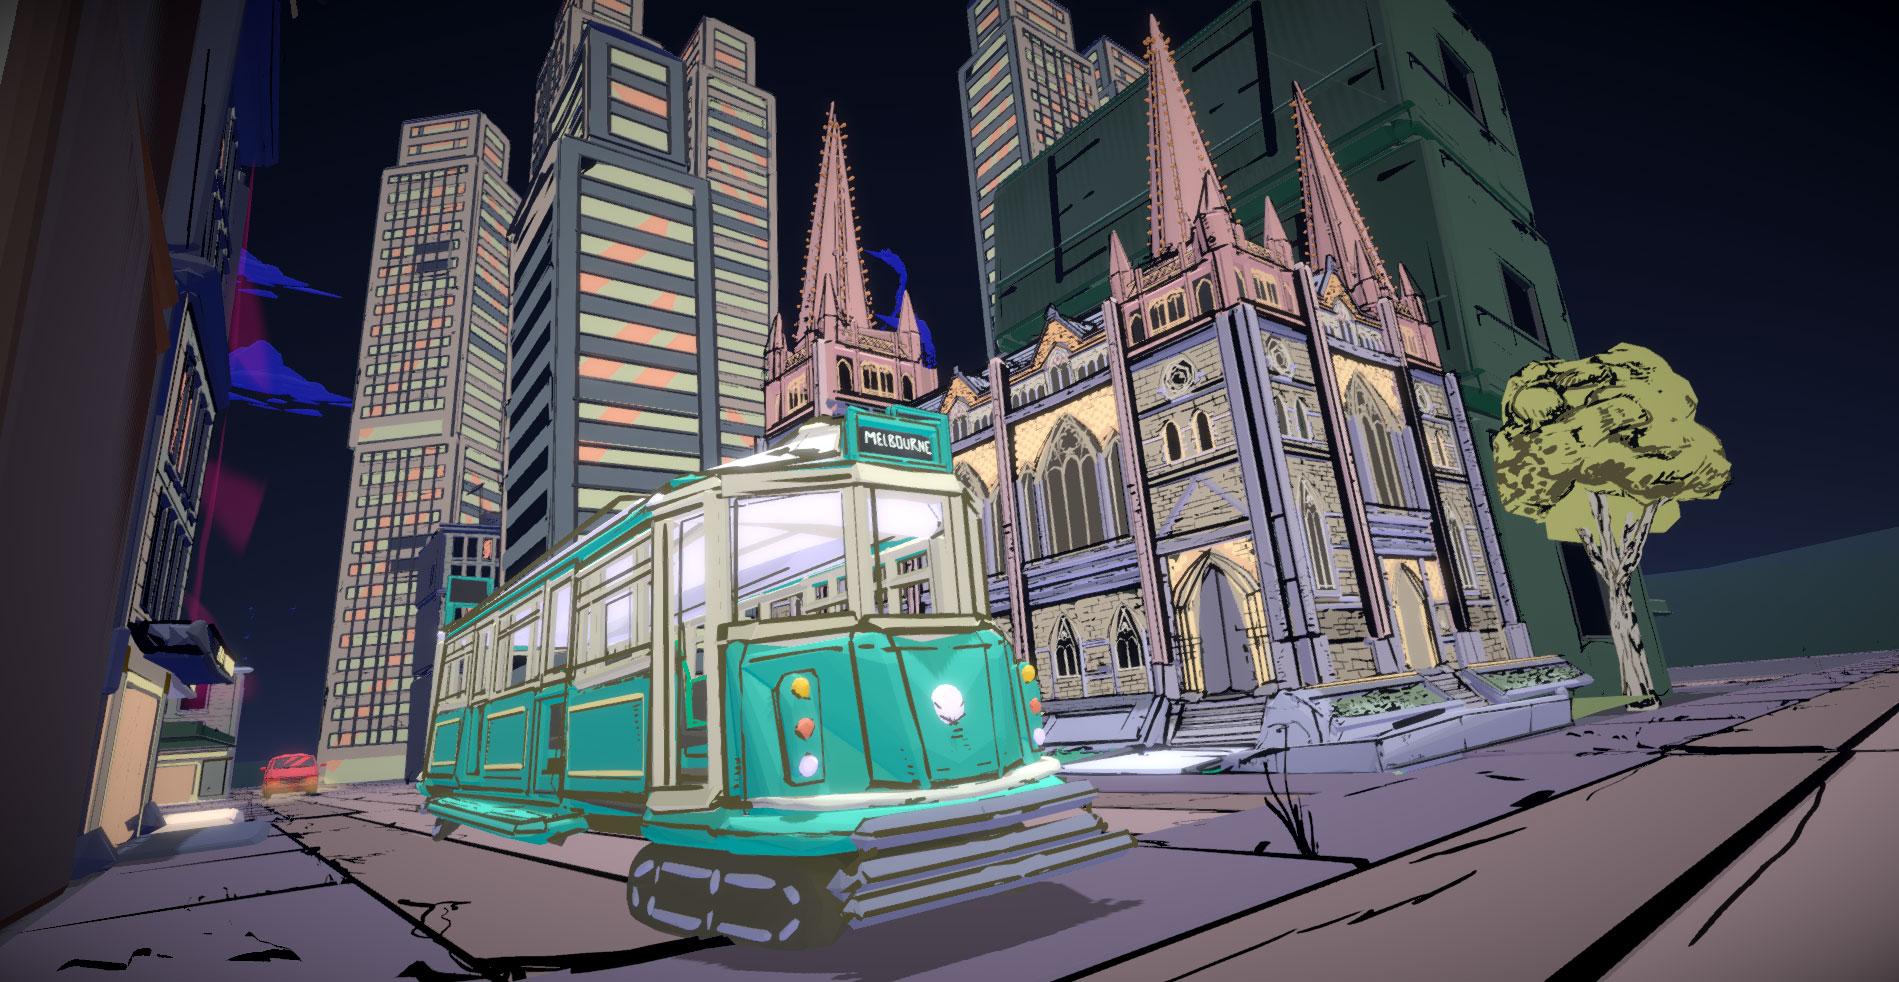 Superheroes_VR_Melbourne1.png.0x1024_q85.jpg